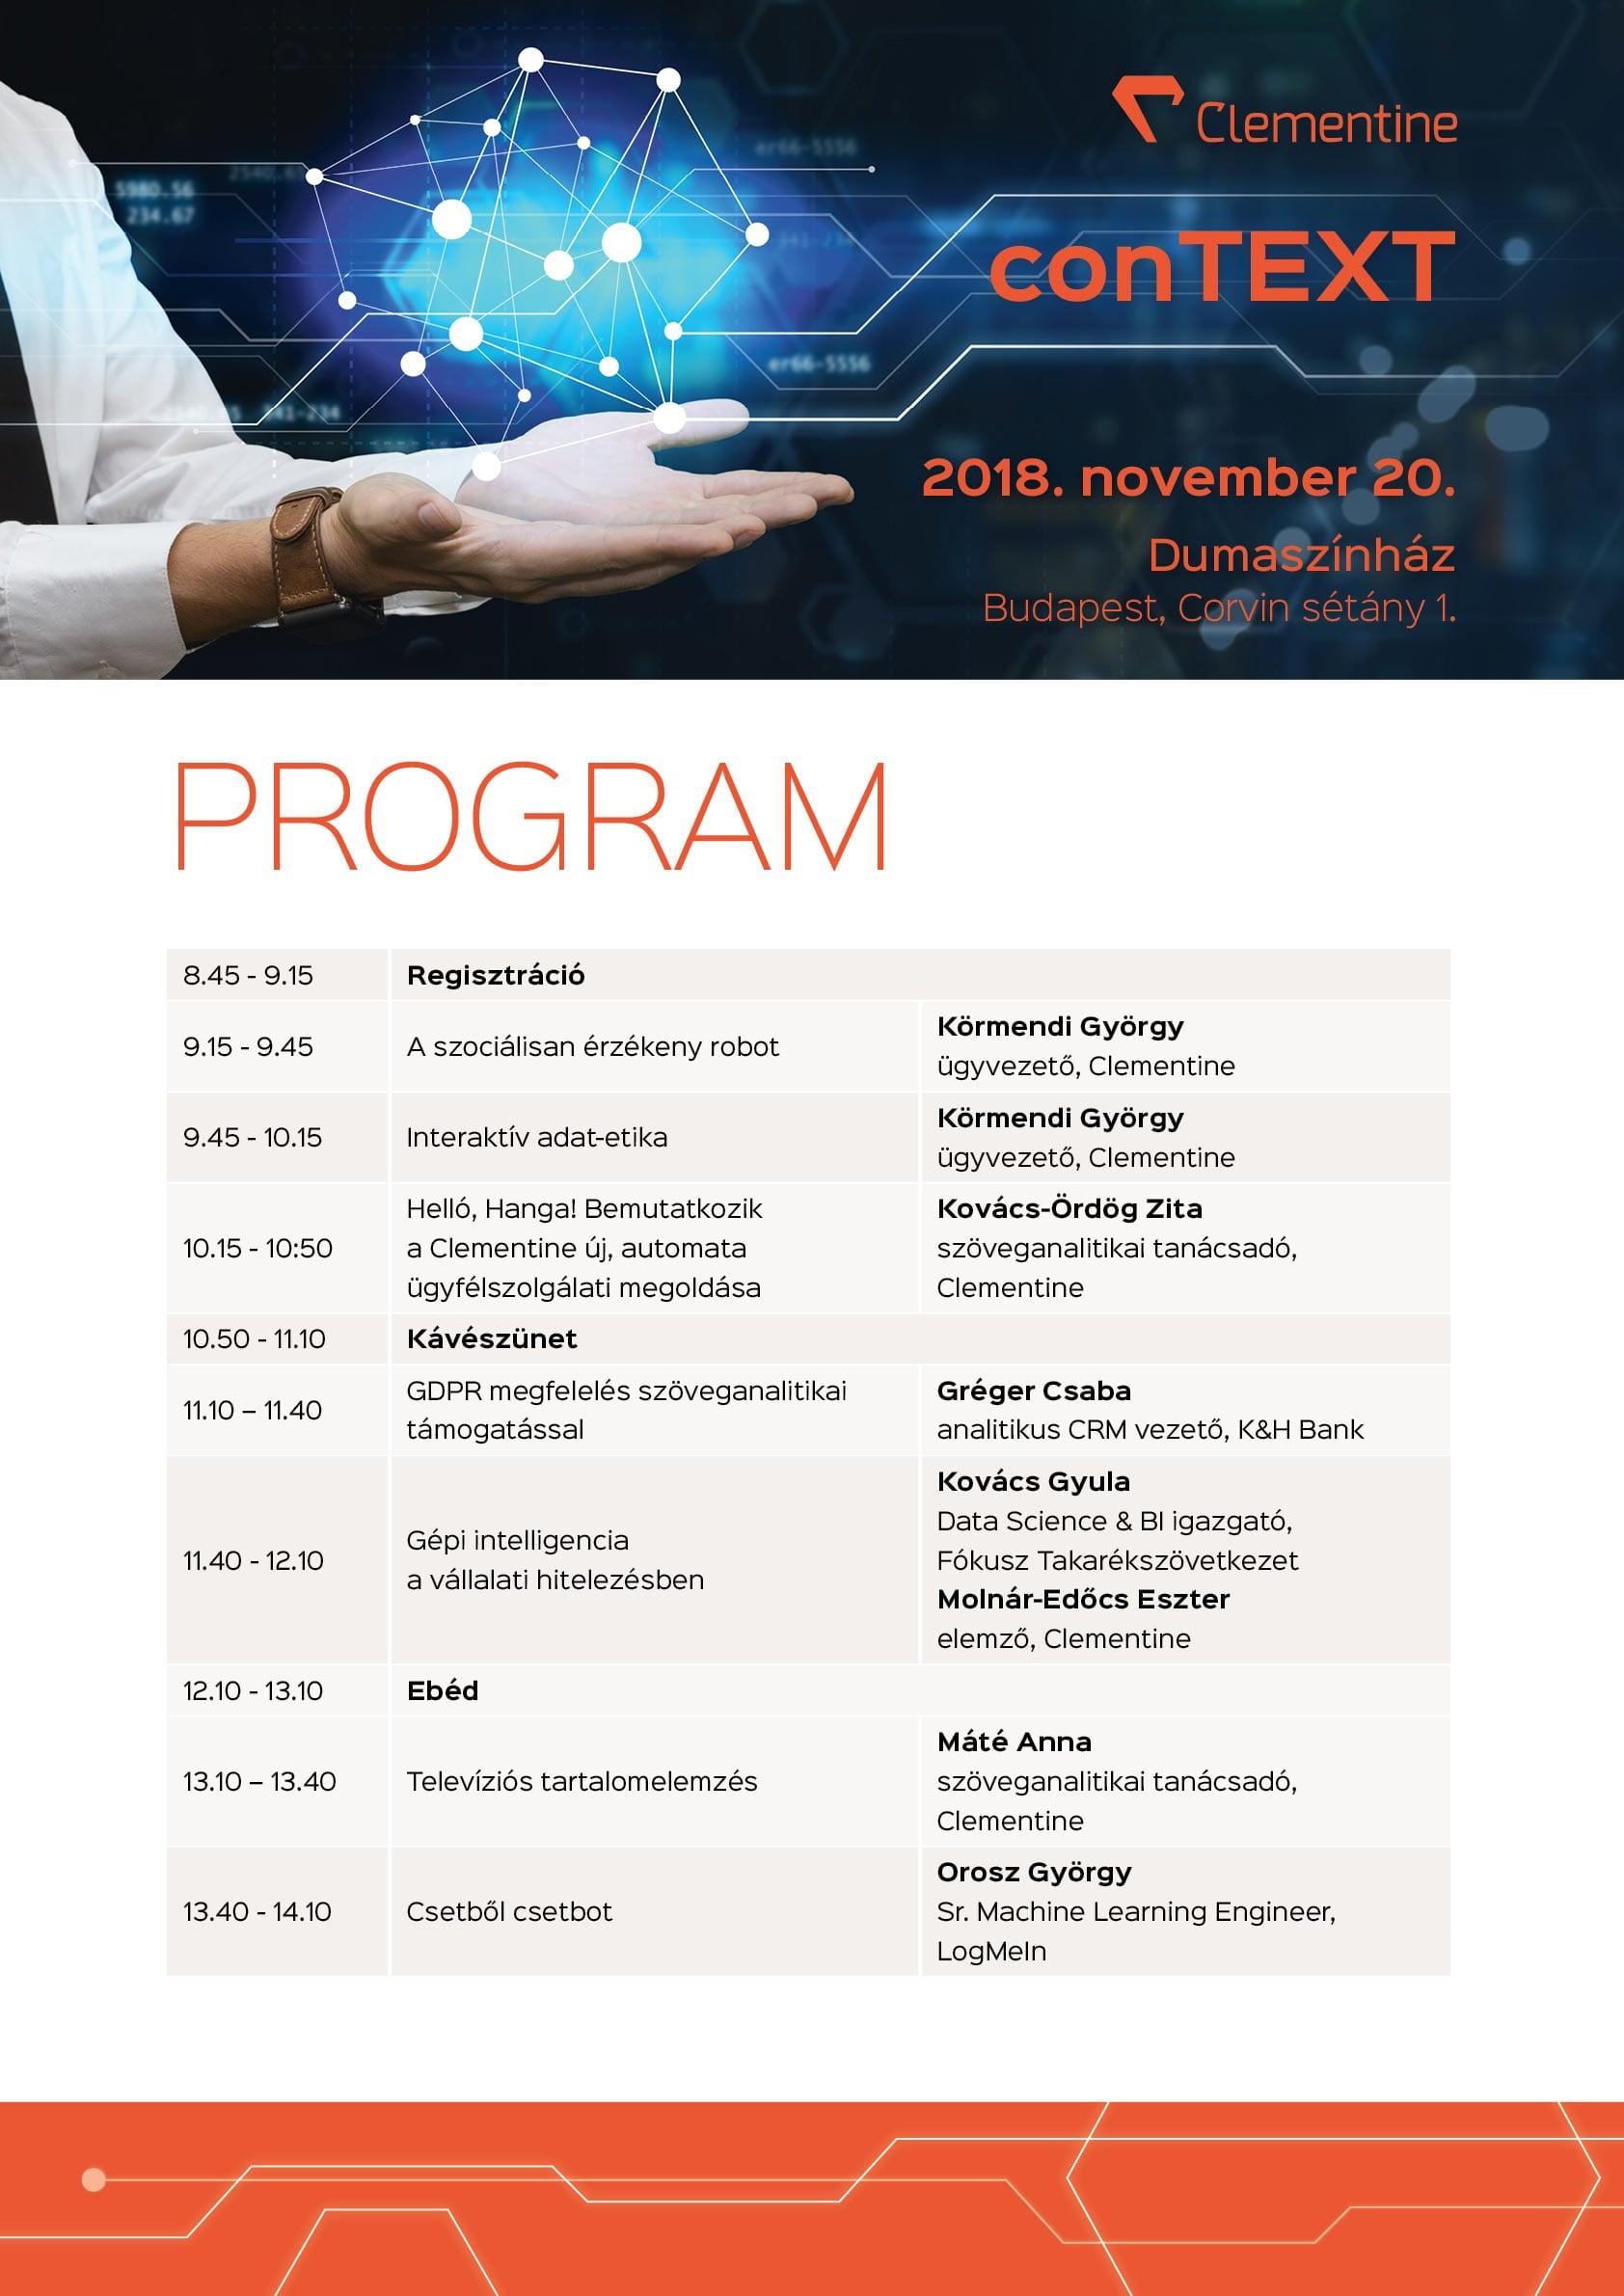 conTEXT 2018 program